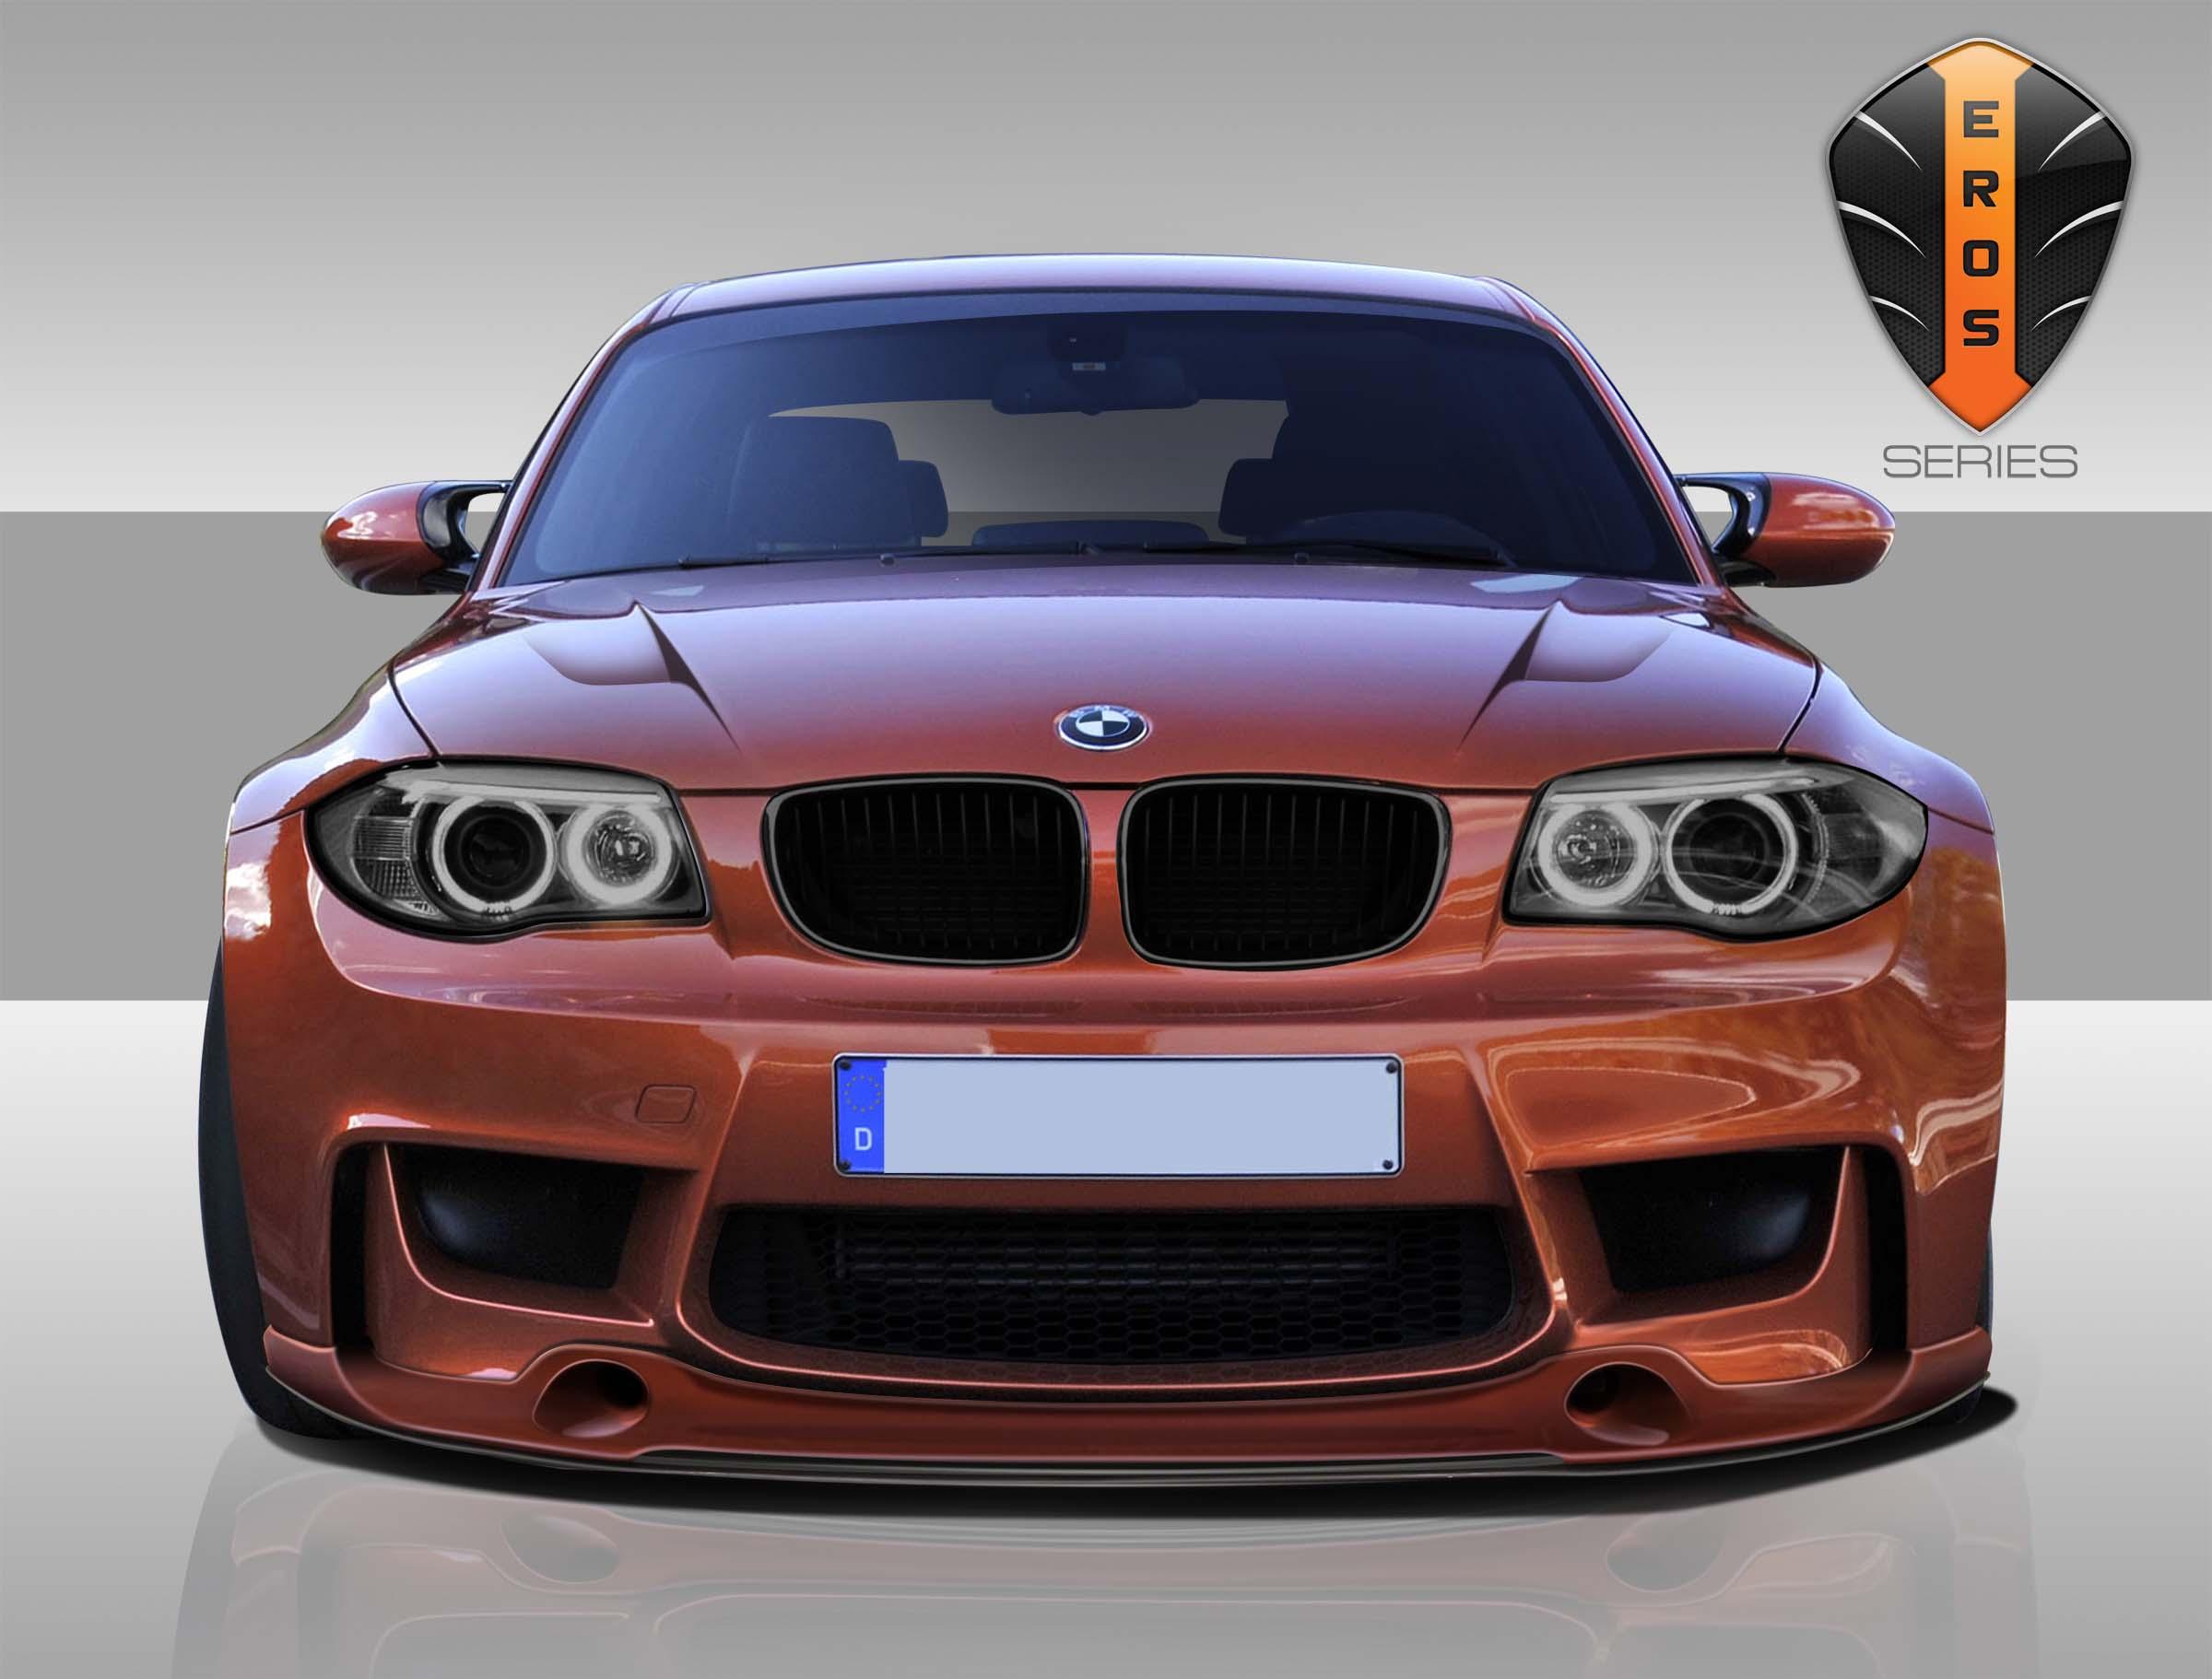 extreme dimensions 2011 2013 bmw 1 series m coupe 1m e82 2dr eros version 1 front lip under. Black Bedroom Furniture Sets. Home Design Ideas